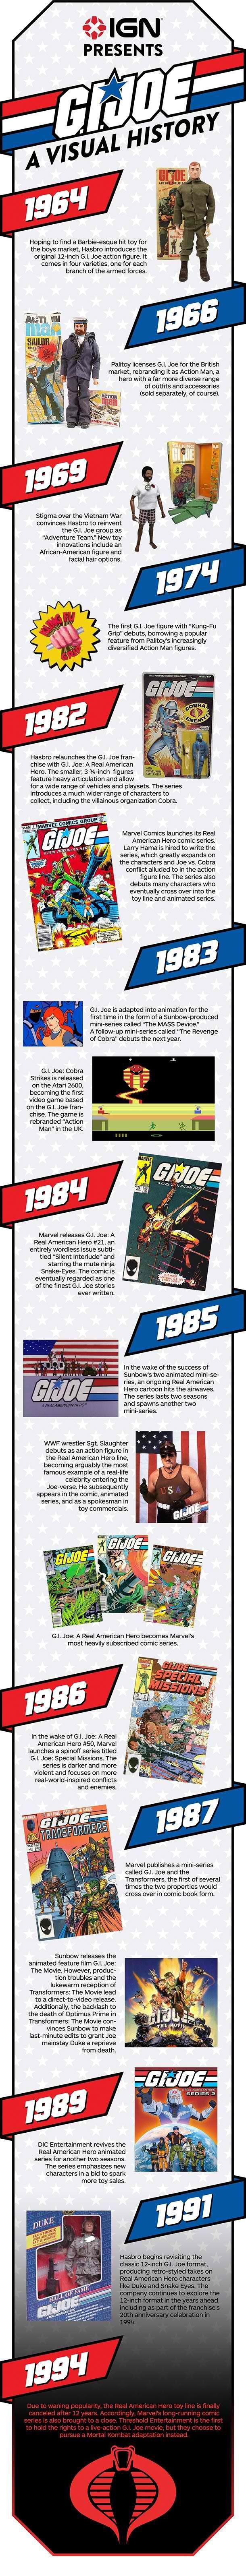 GI Joe A Visual History - infographic #Nostalgia #Toys #ActionFigures